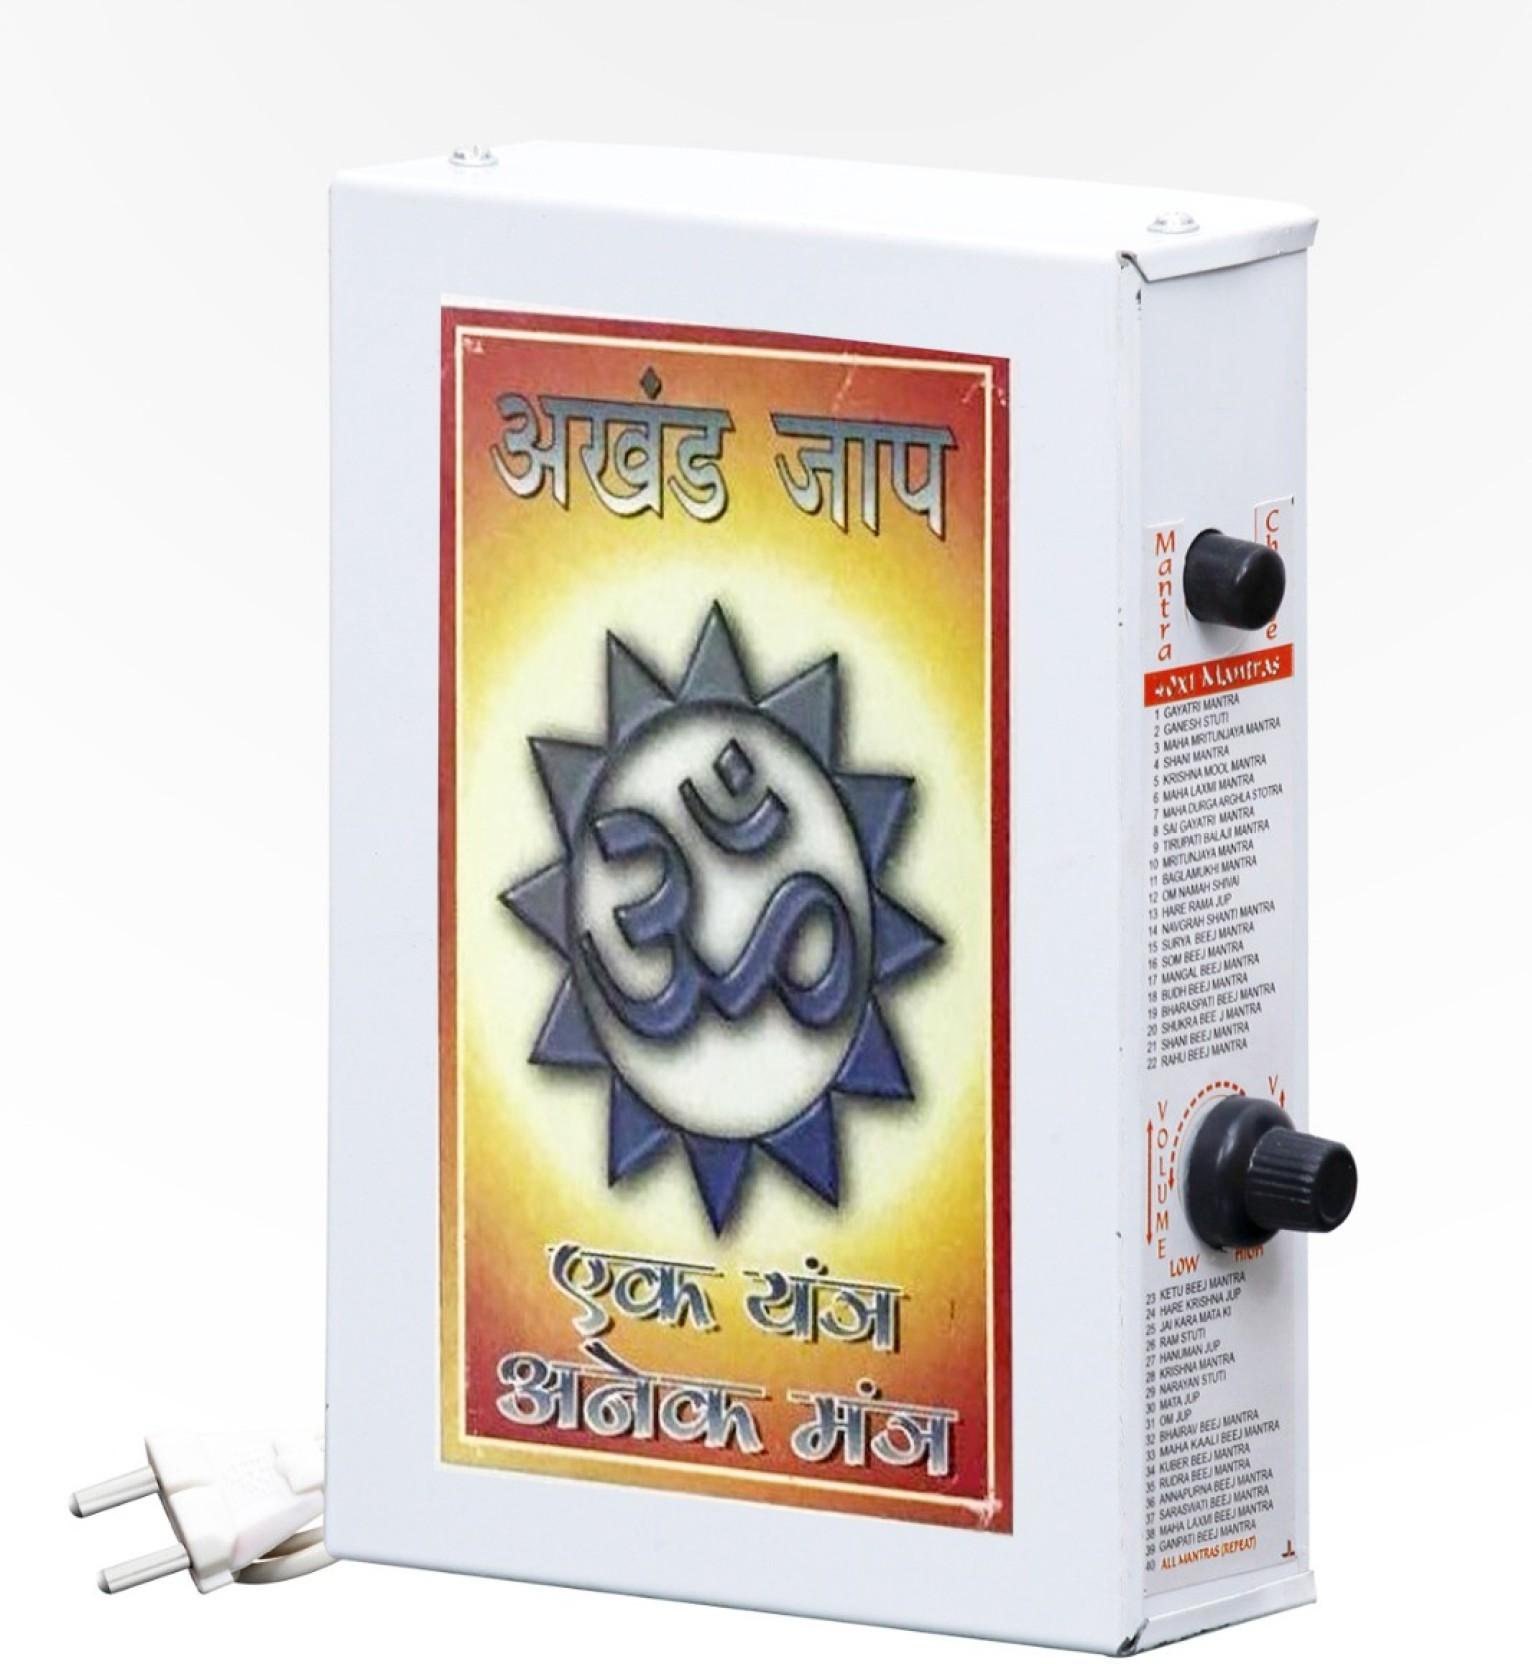 Sri Krishna Culture 40 in 1 ( All in 1) Shloka Mantra Chanting Box Prayer  Kit